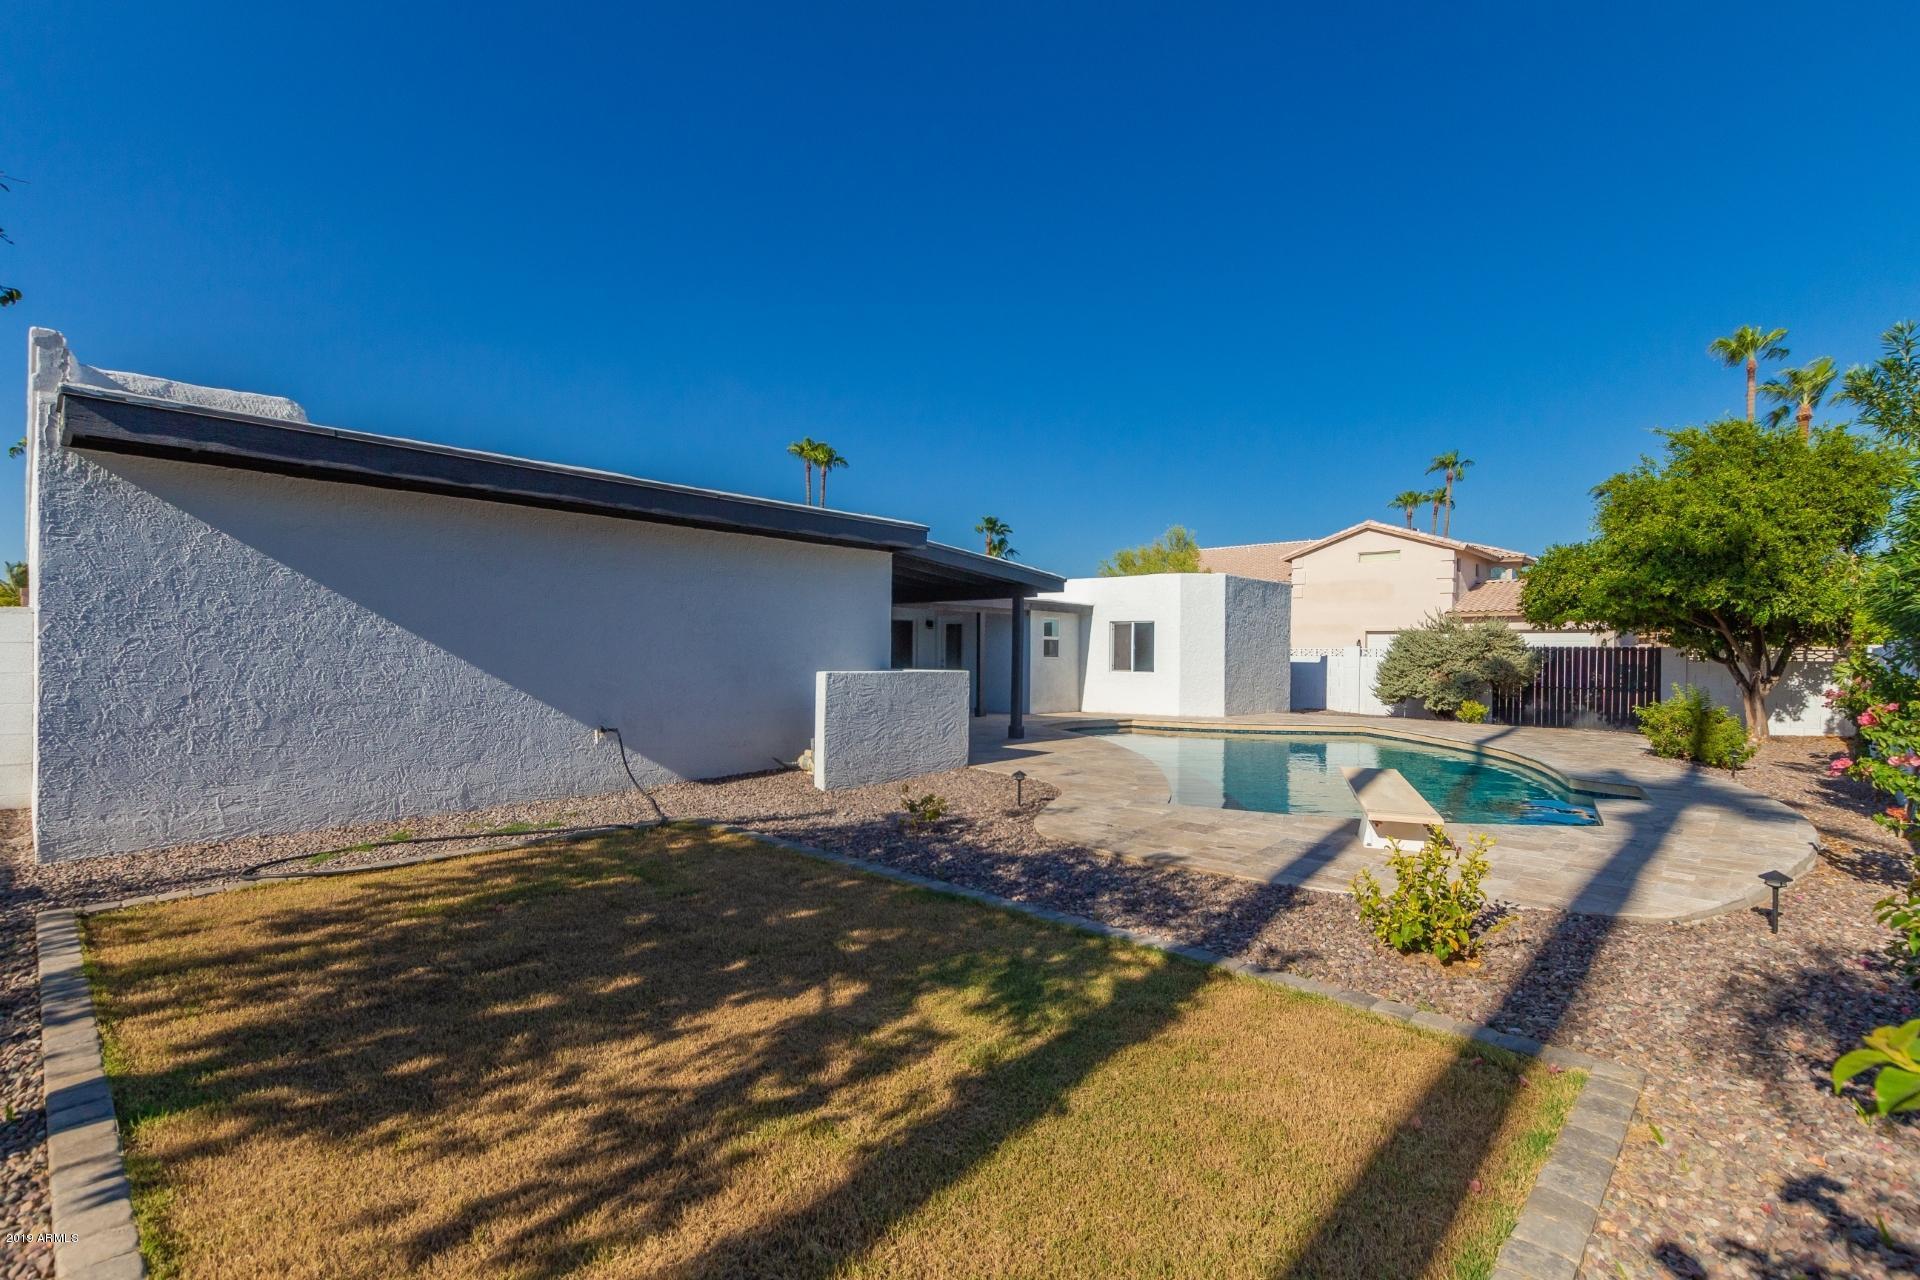 MLS 5966597 5355 E MARILYN Road, Scottsdale, AZ 85254 Scottsdale AZ Private Pool